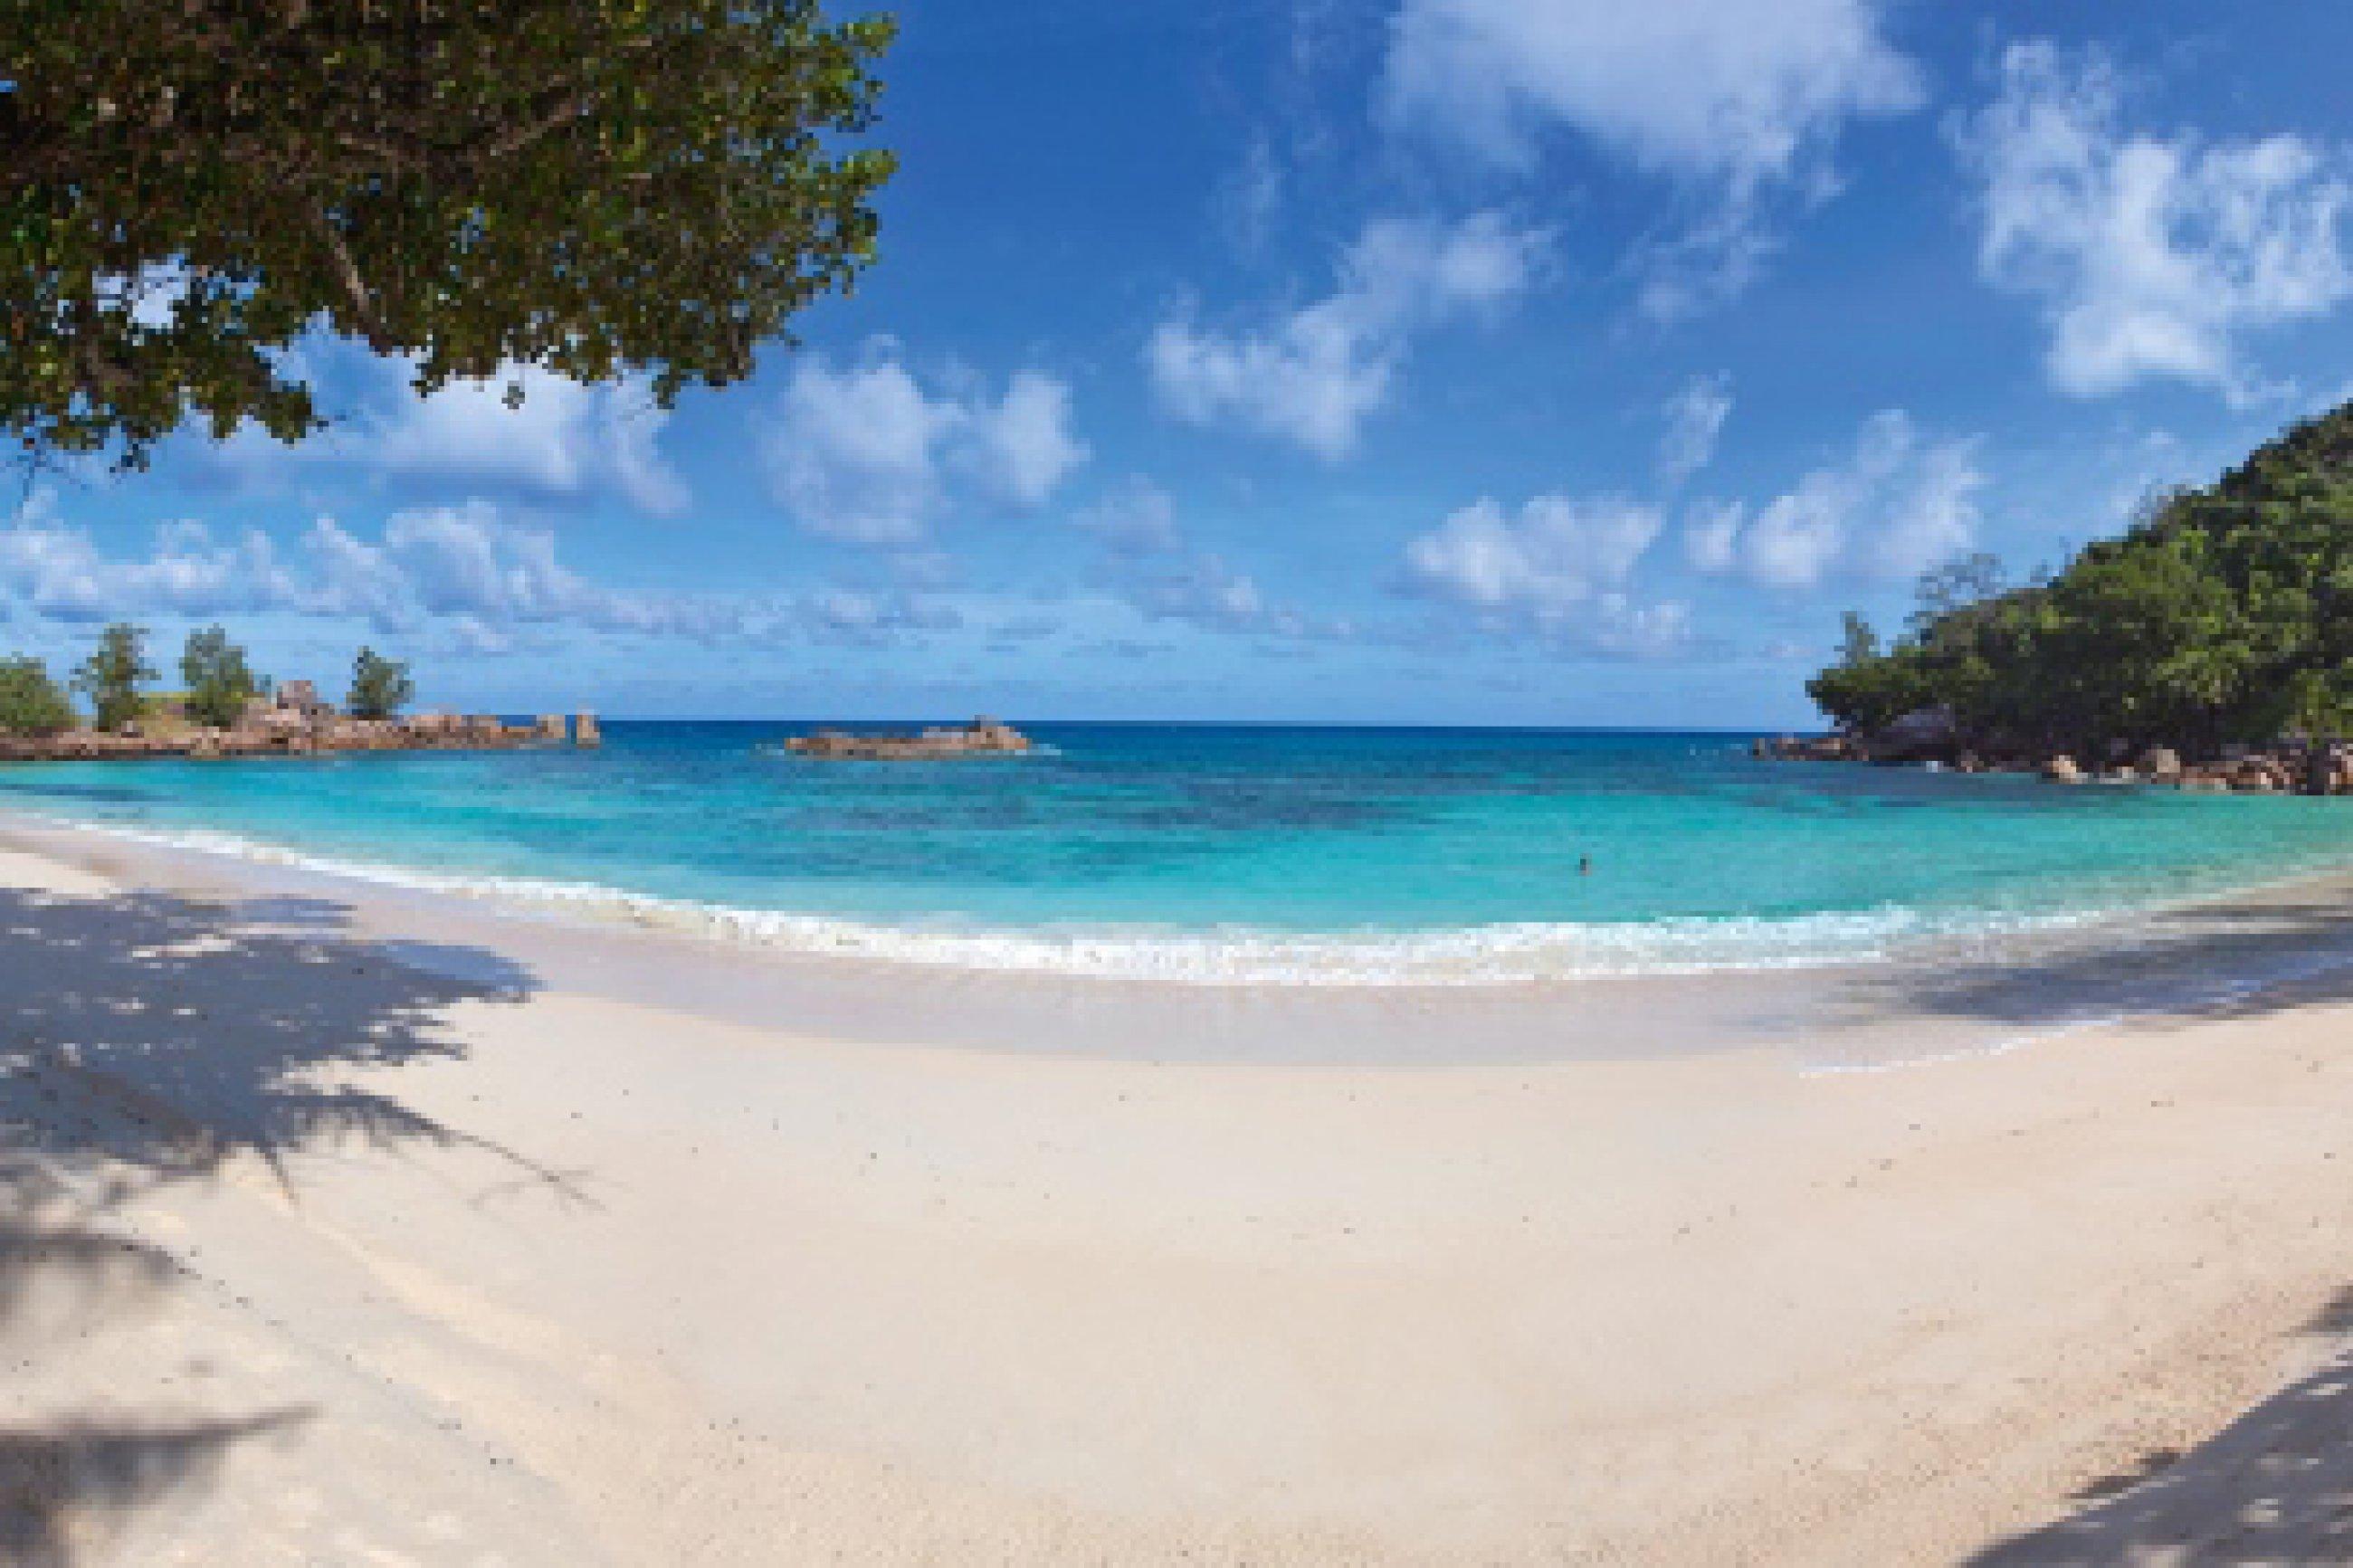 https://bubo.sk/uploads/galleries/16287/lemuria-seychelles-beach-23.jpg